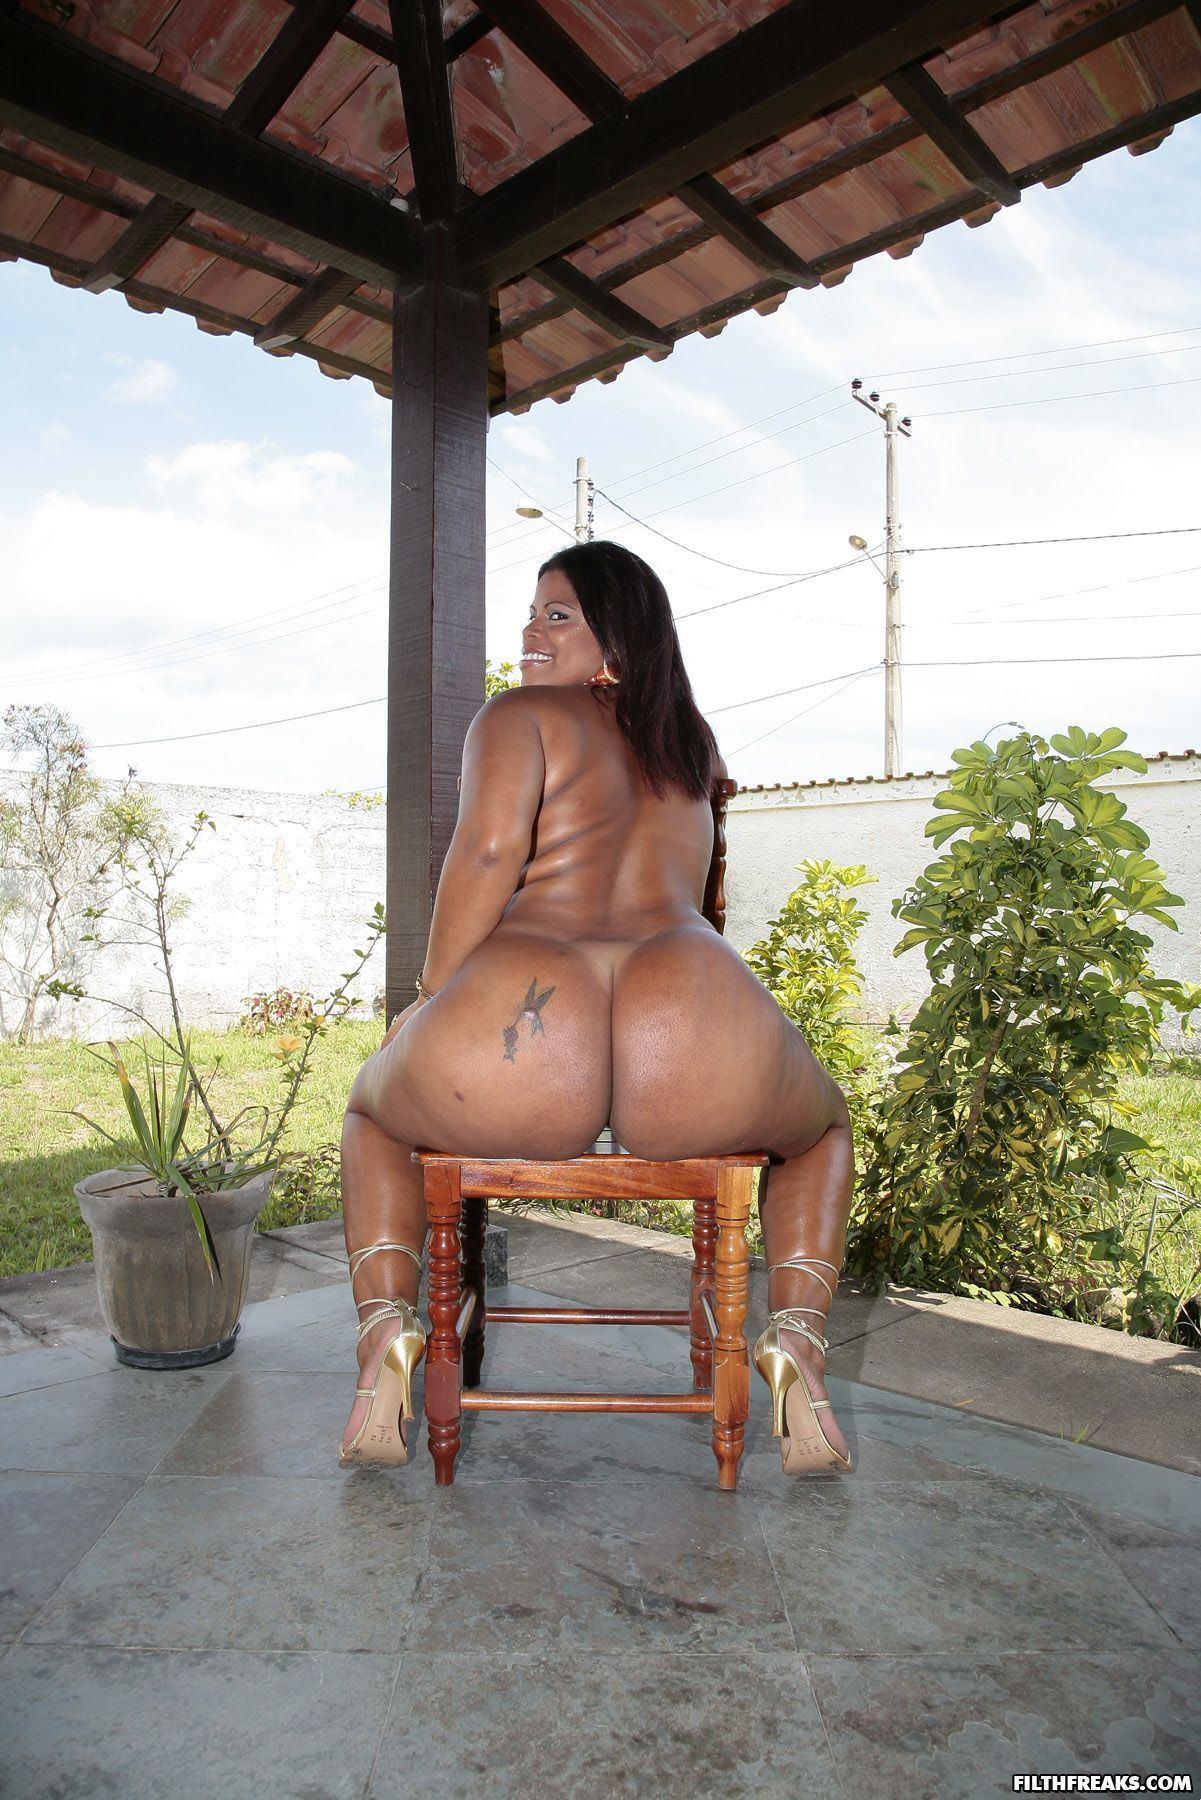 Ass Porm fat ass brazzilian porm free . pussy sex images.